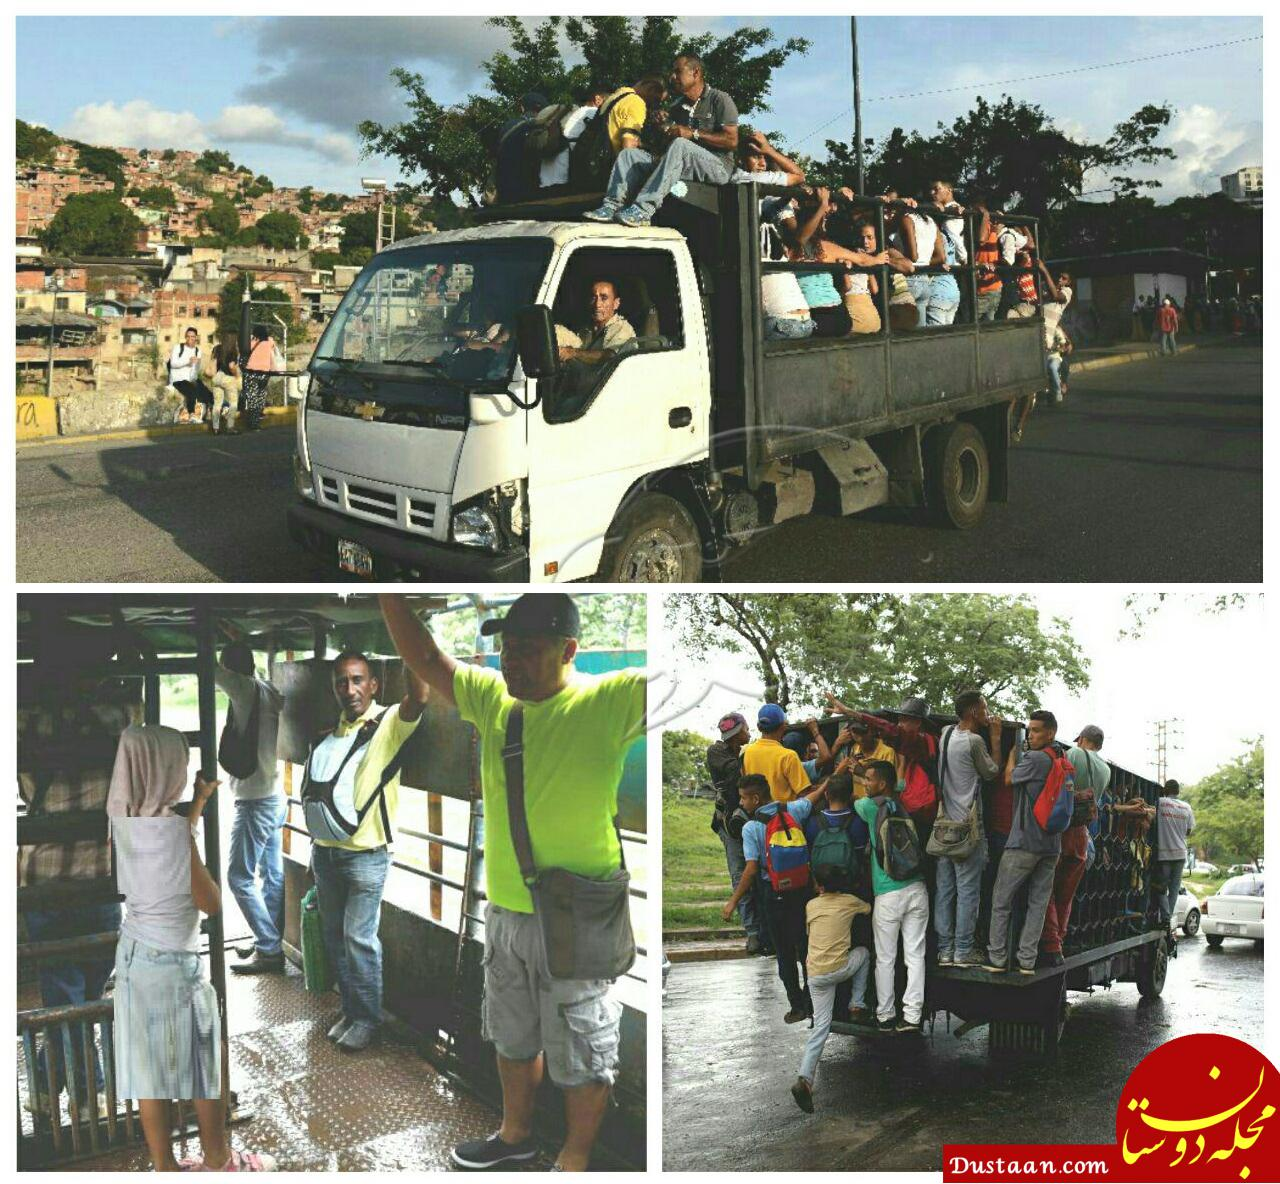 www.dustaan.com استفاده از کامیون باری به جای اتوبوس! +عکس